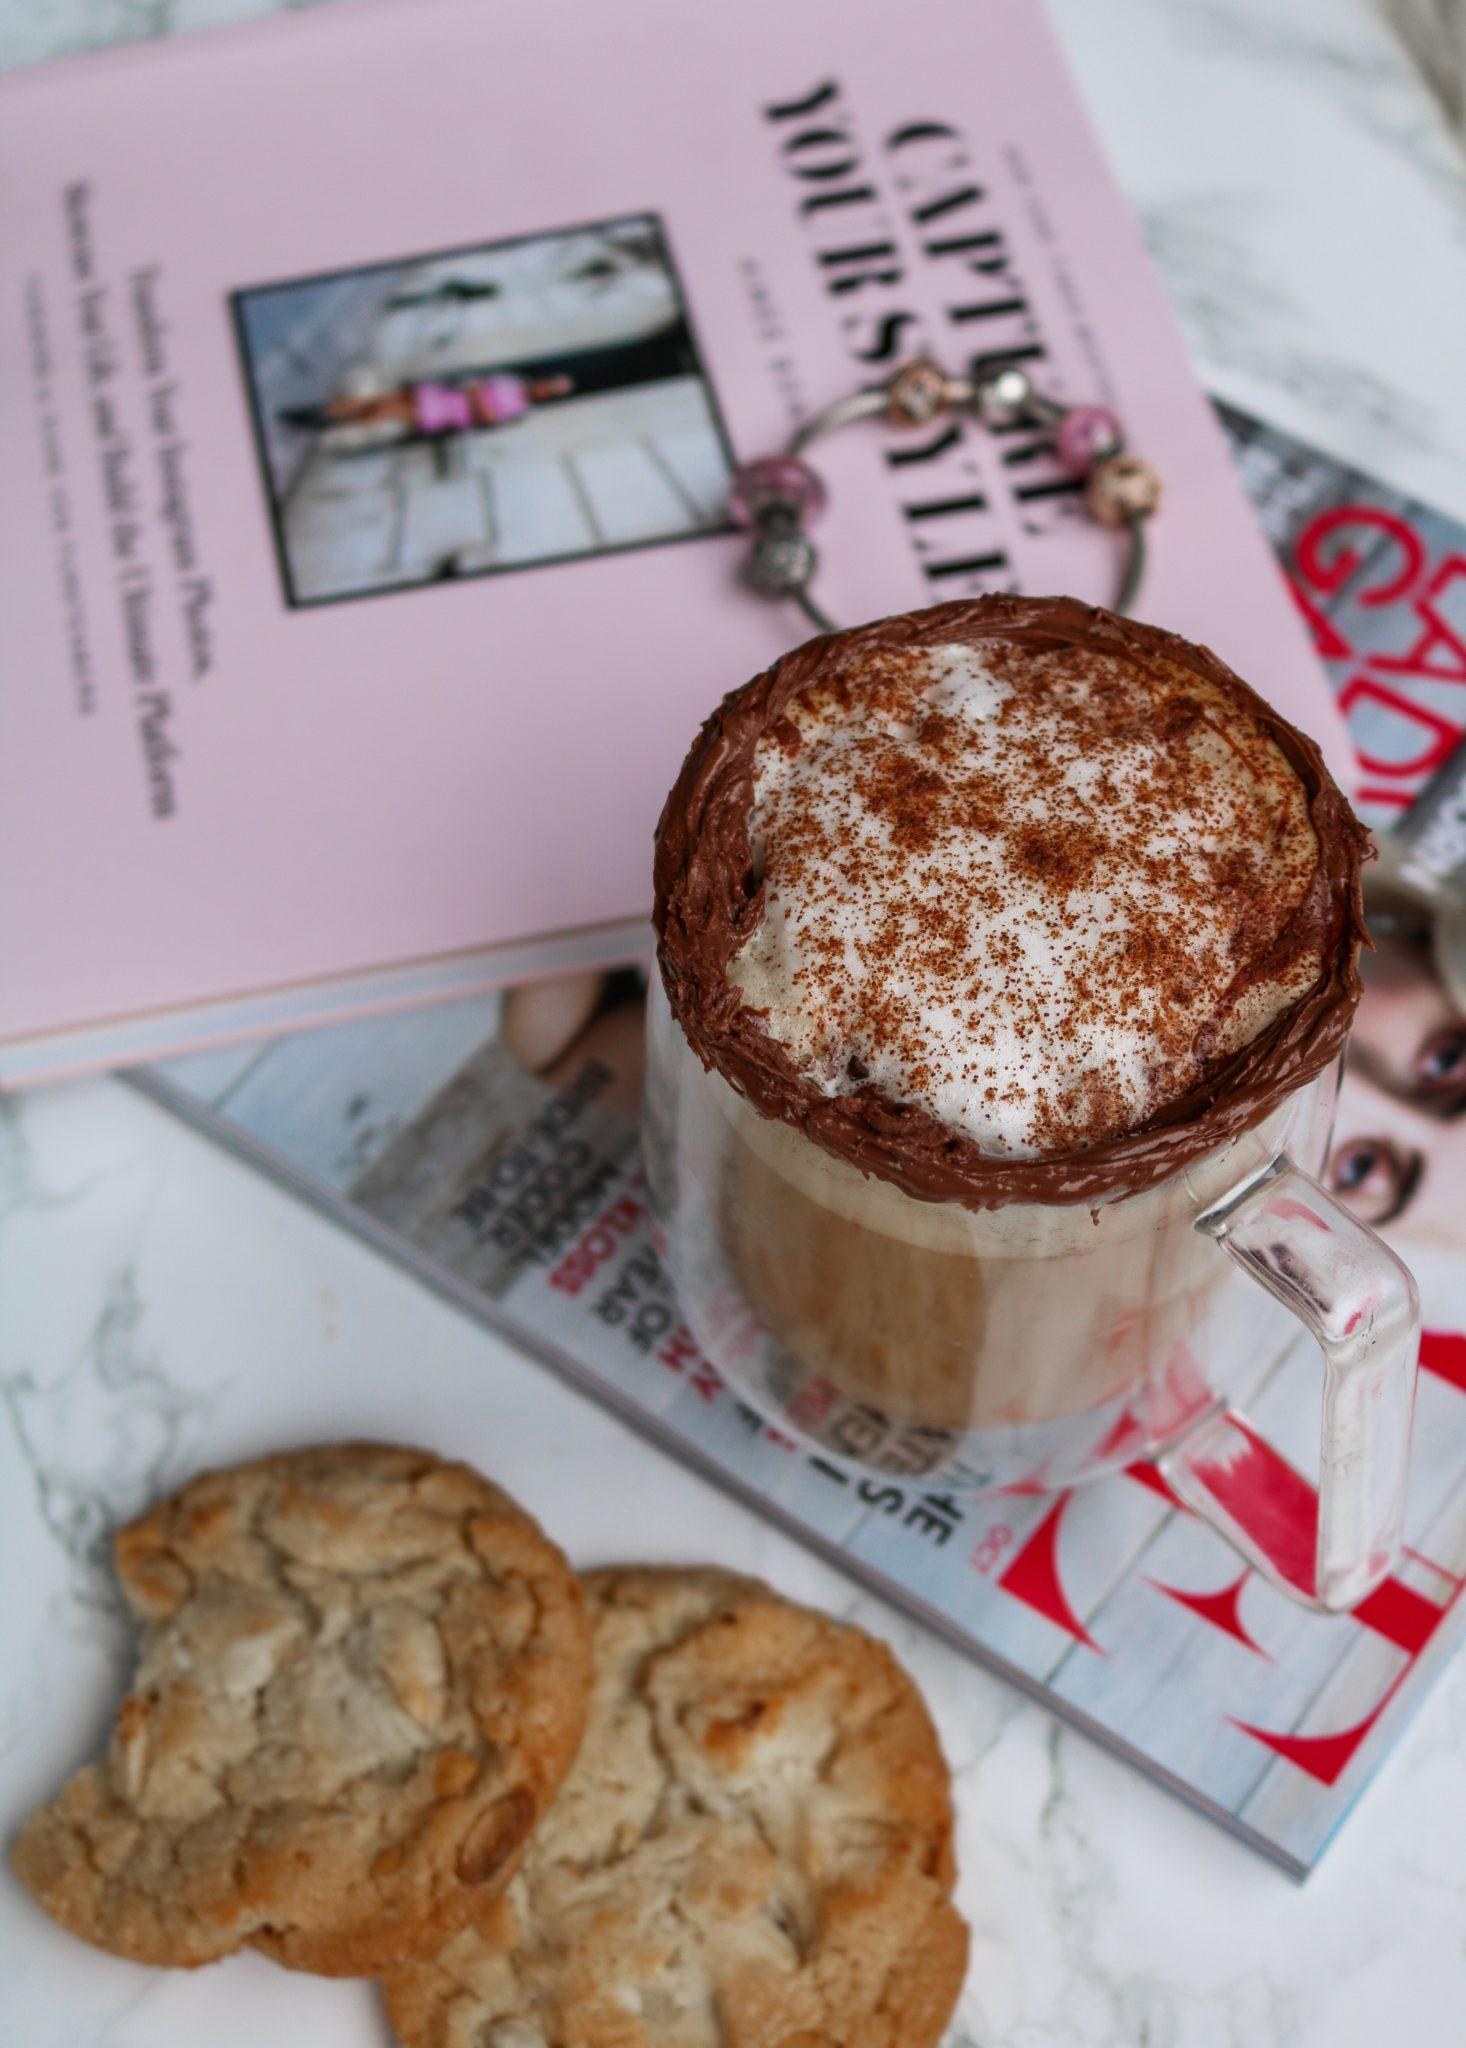 The-Hungarian-Brunette-Nutella-Latte-Recipe-1-of-5.jpg